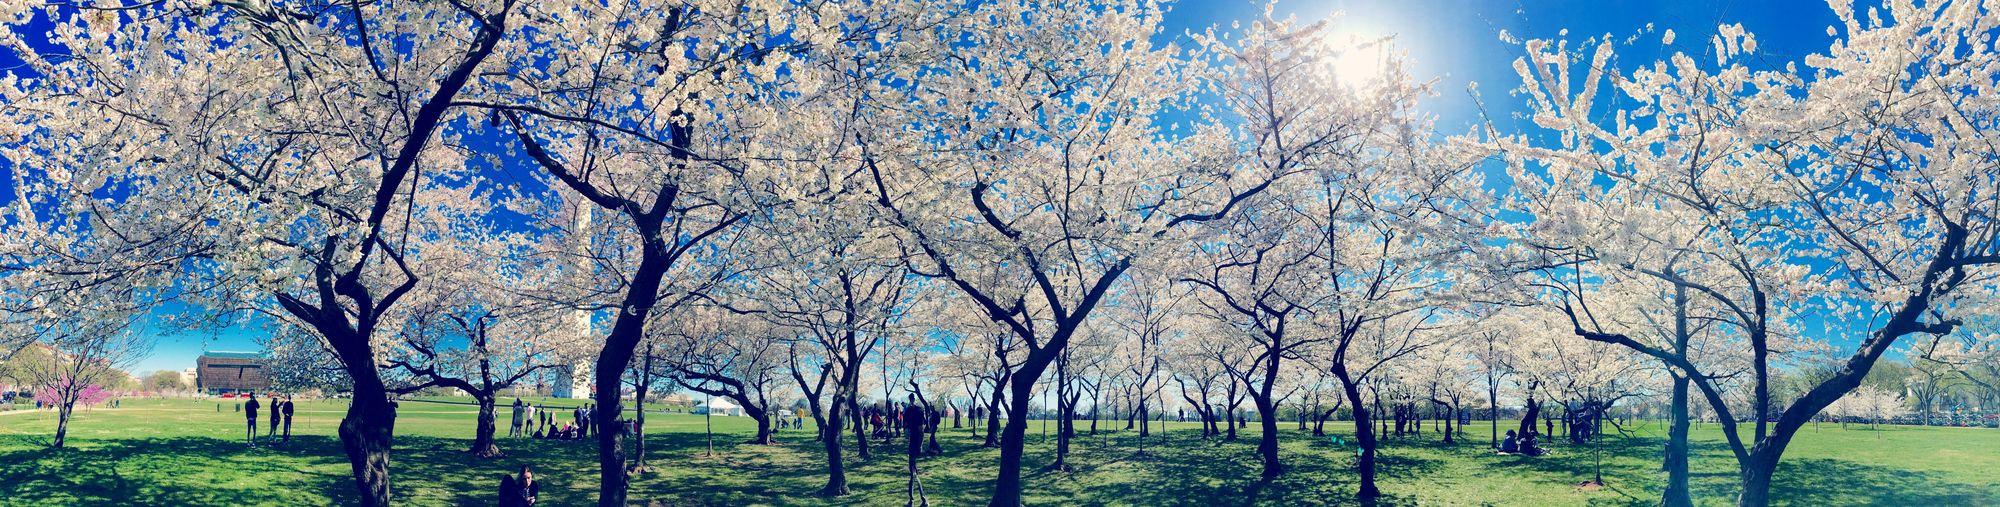 Cherry Blossoms Nature Photography Naturelover Panoramicshot Taking Photos Travel Photography Washington, D. C.